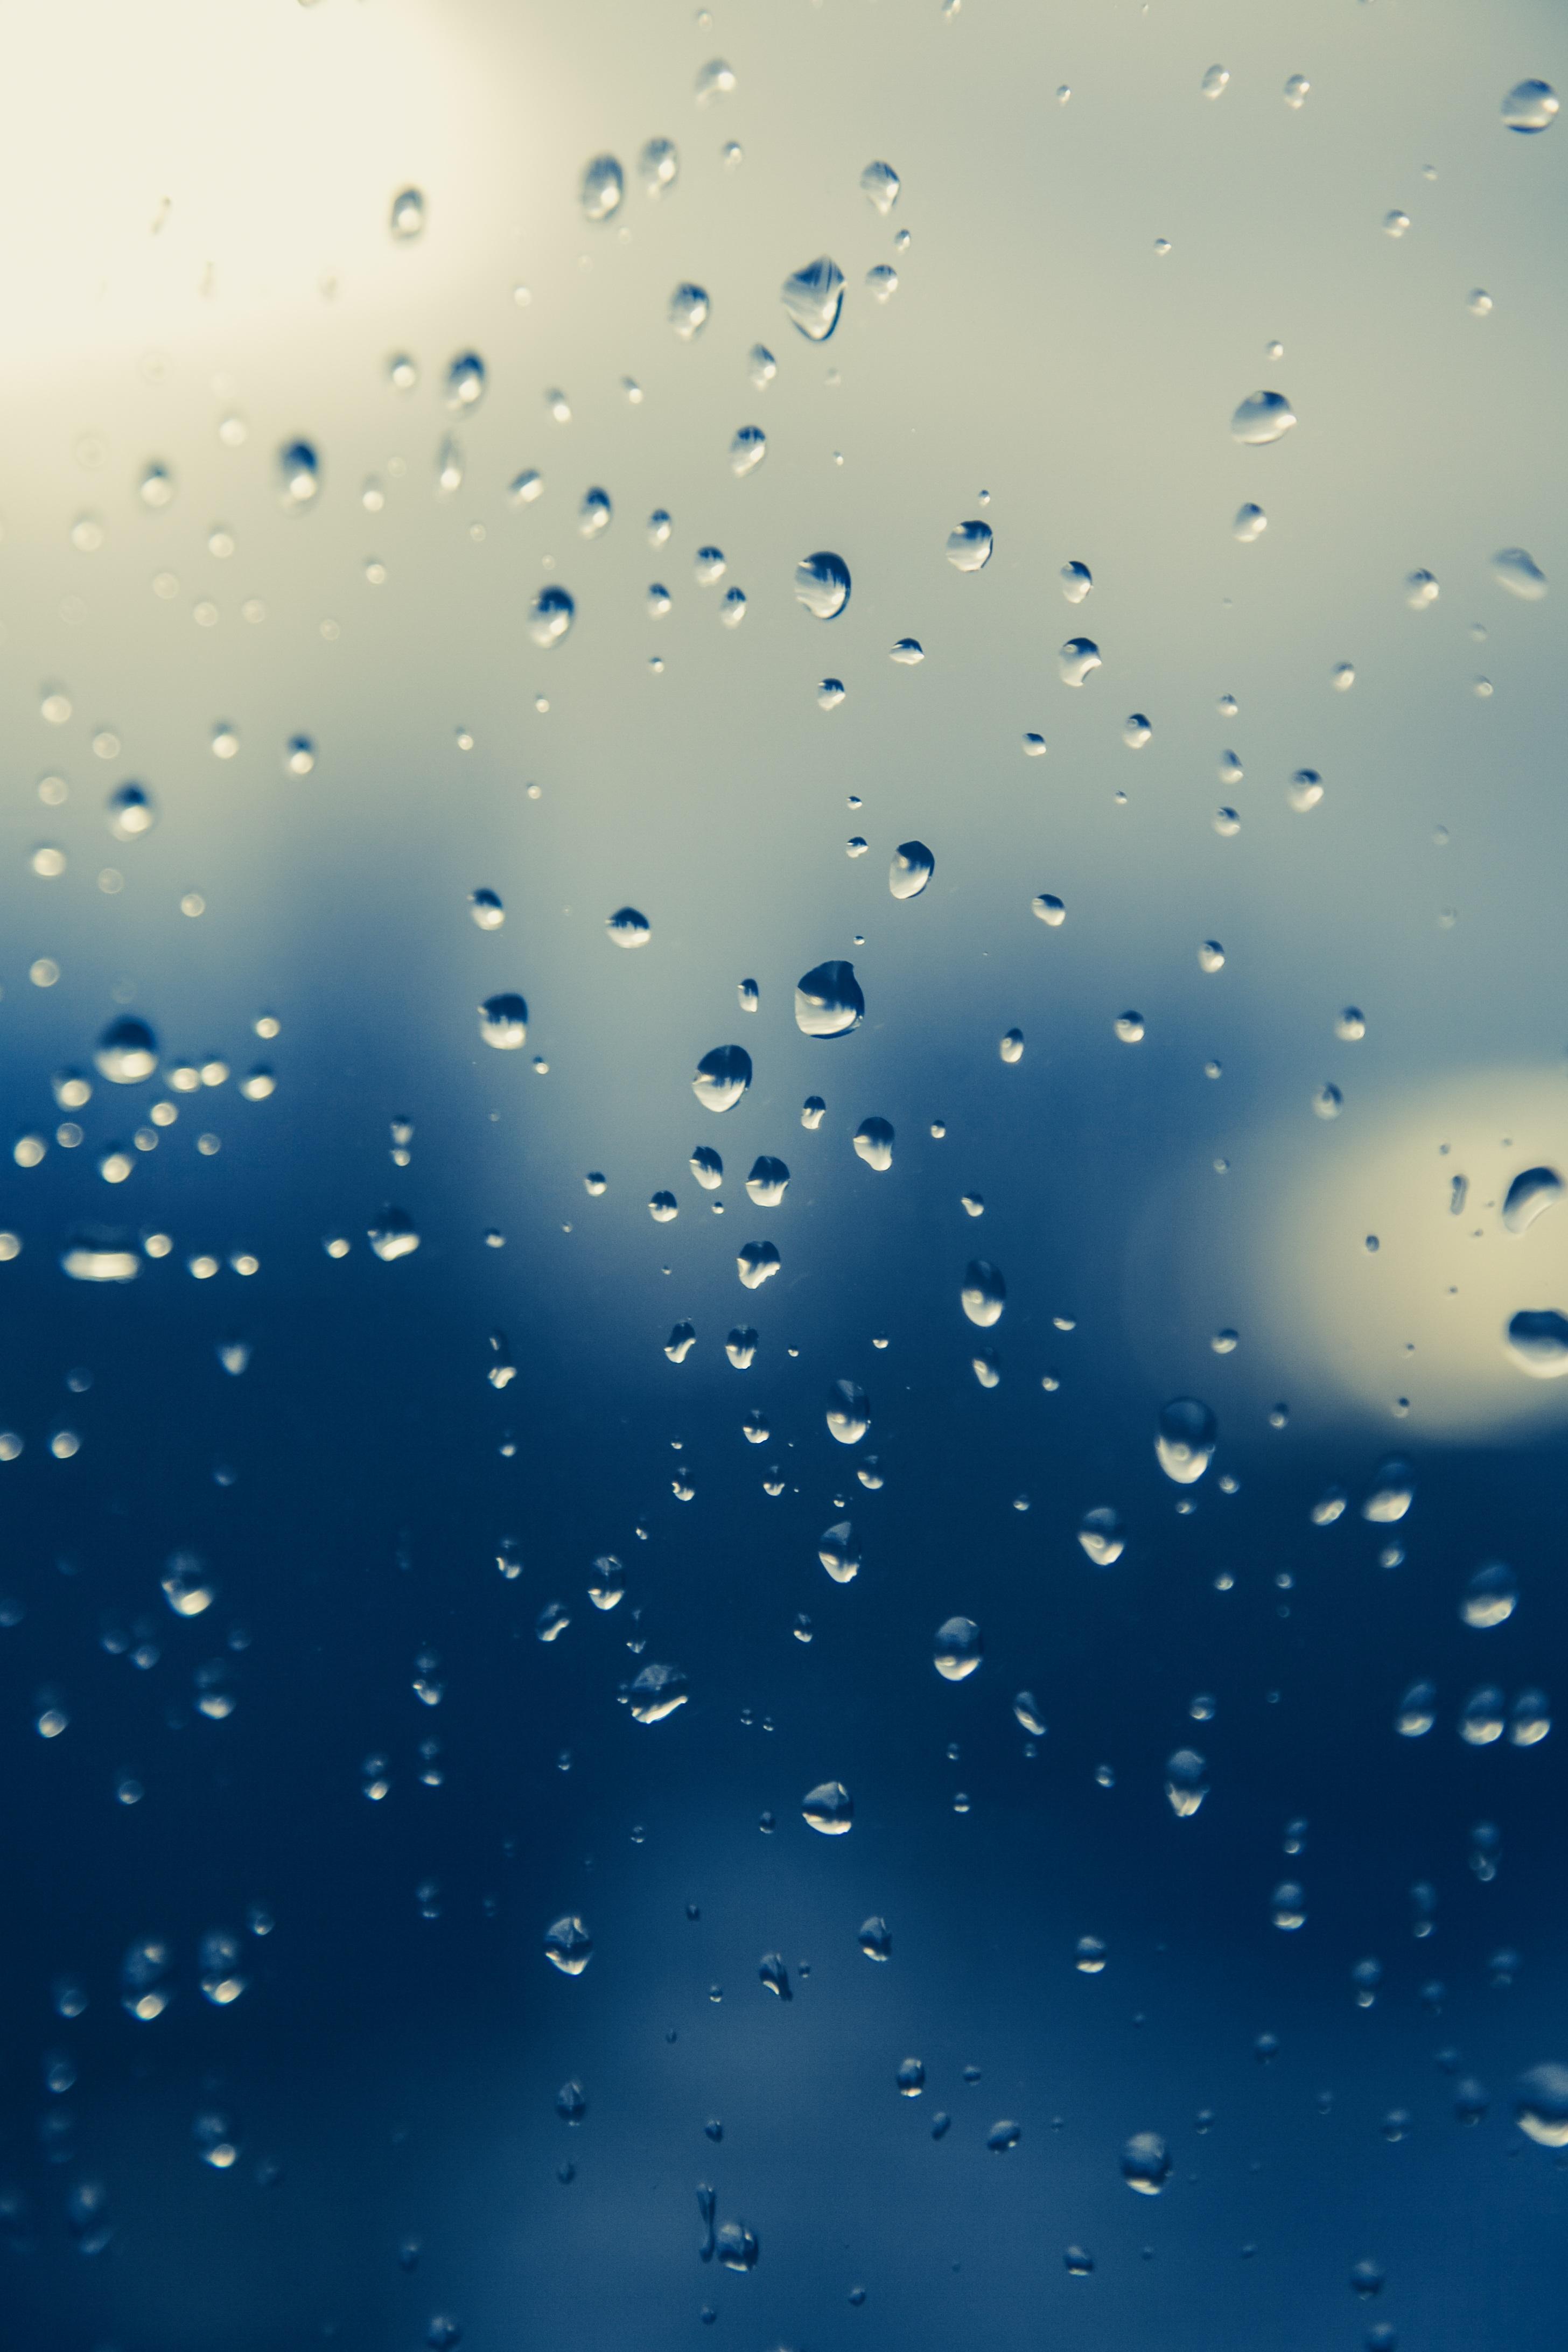 Free Images Liquid Structure Sky Raindrop Wet Line Reflection Spray Macro Blue Drip Window Pane Blurry Drop Of Water Disc Moisture Freezing Beaded Window Glass Run Off Drops Of Rain Bad Macro drops blur glare colorful glass